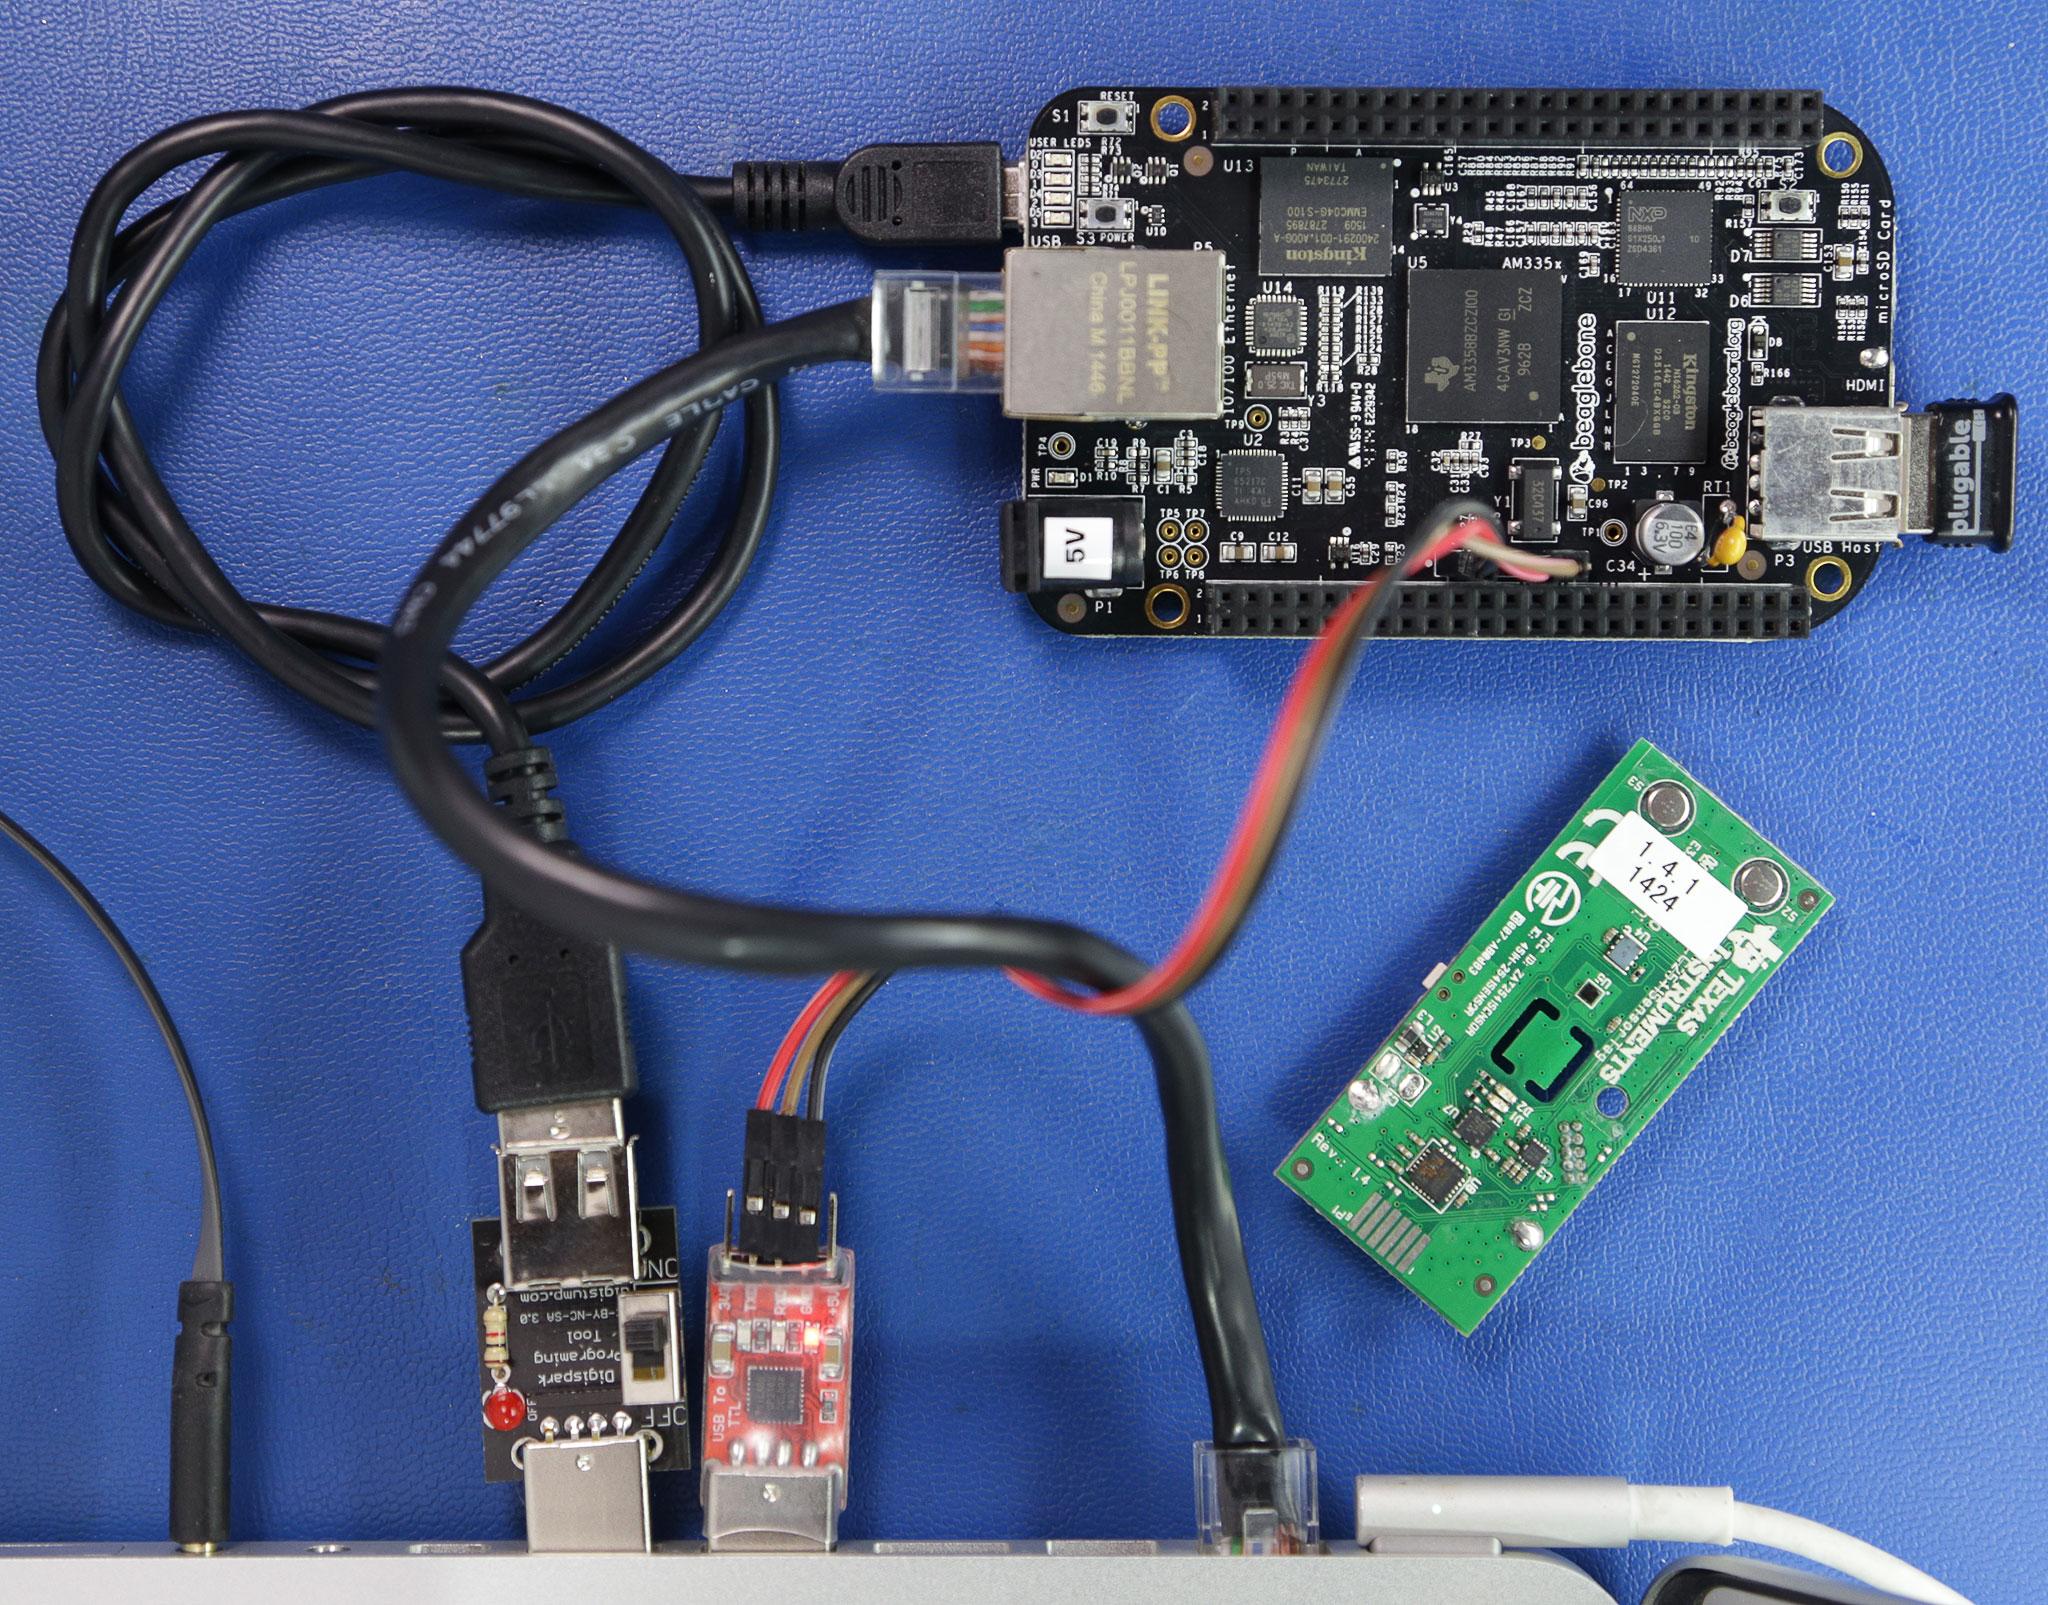 Ship IoT with Beaglebone Black, TI Sensortags, and